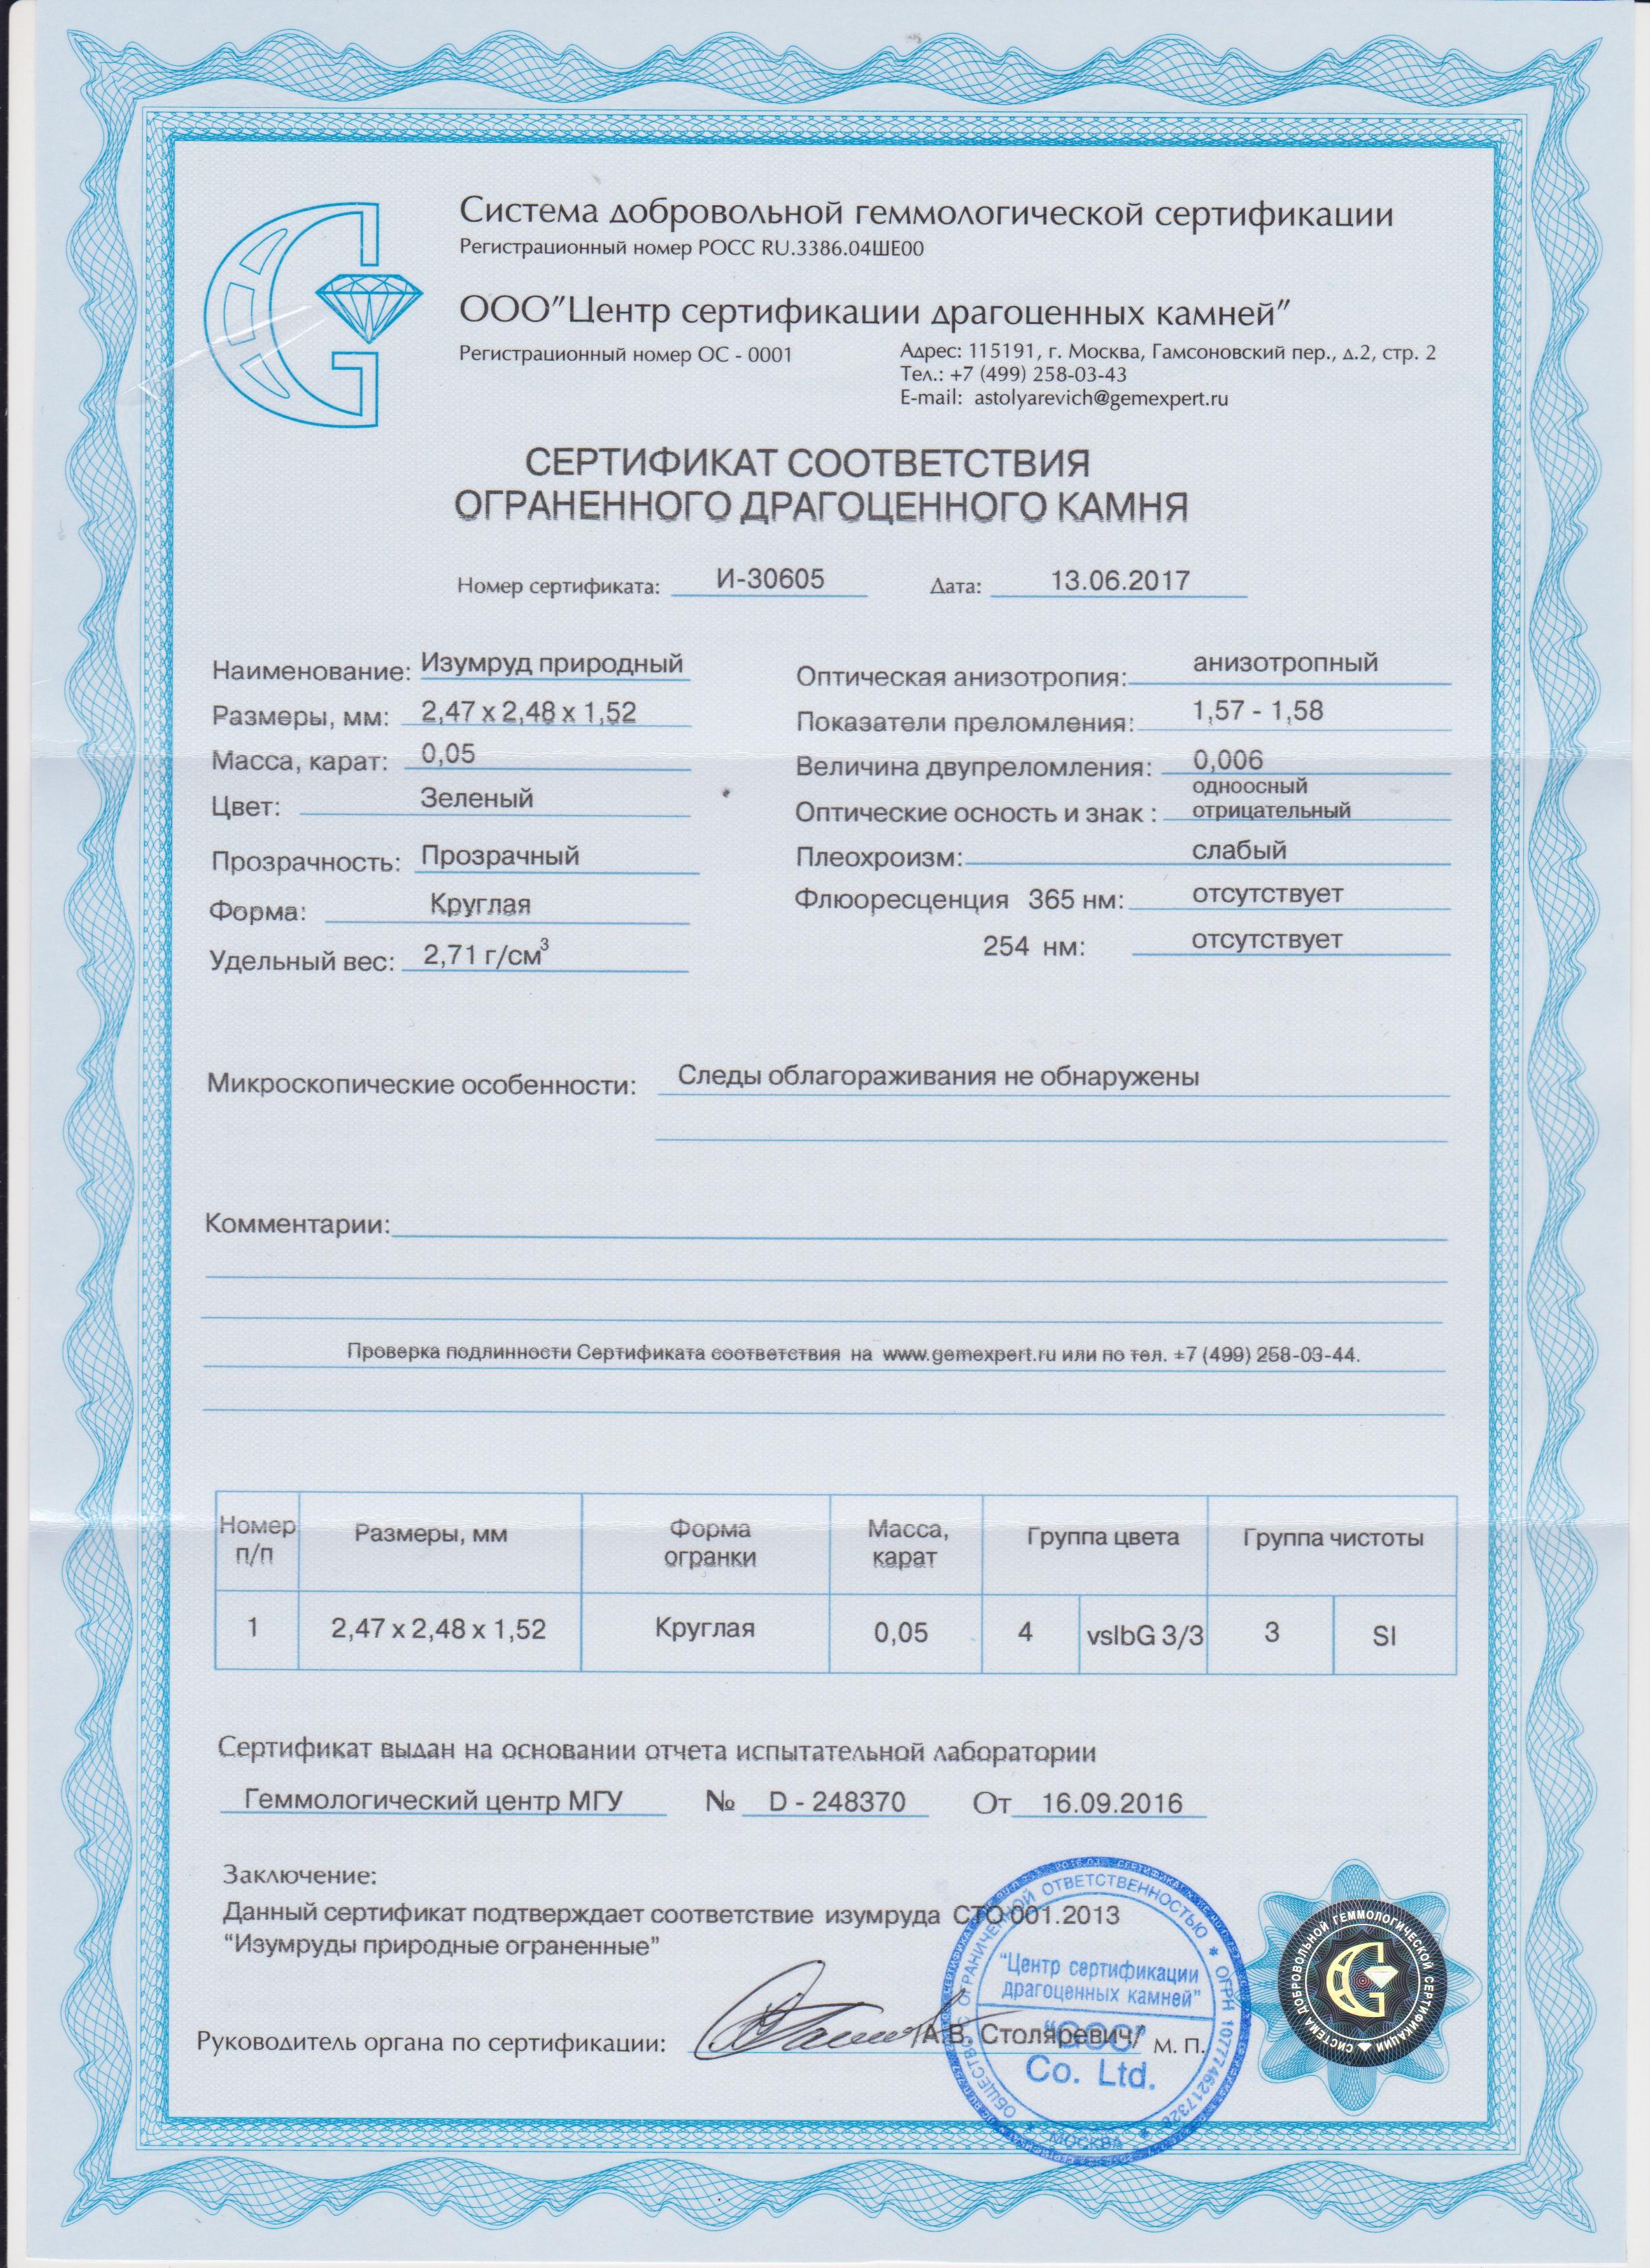 https://mineralmarket.ru/img/certificate/52/1497884245.jpg